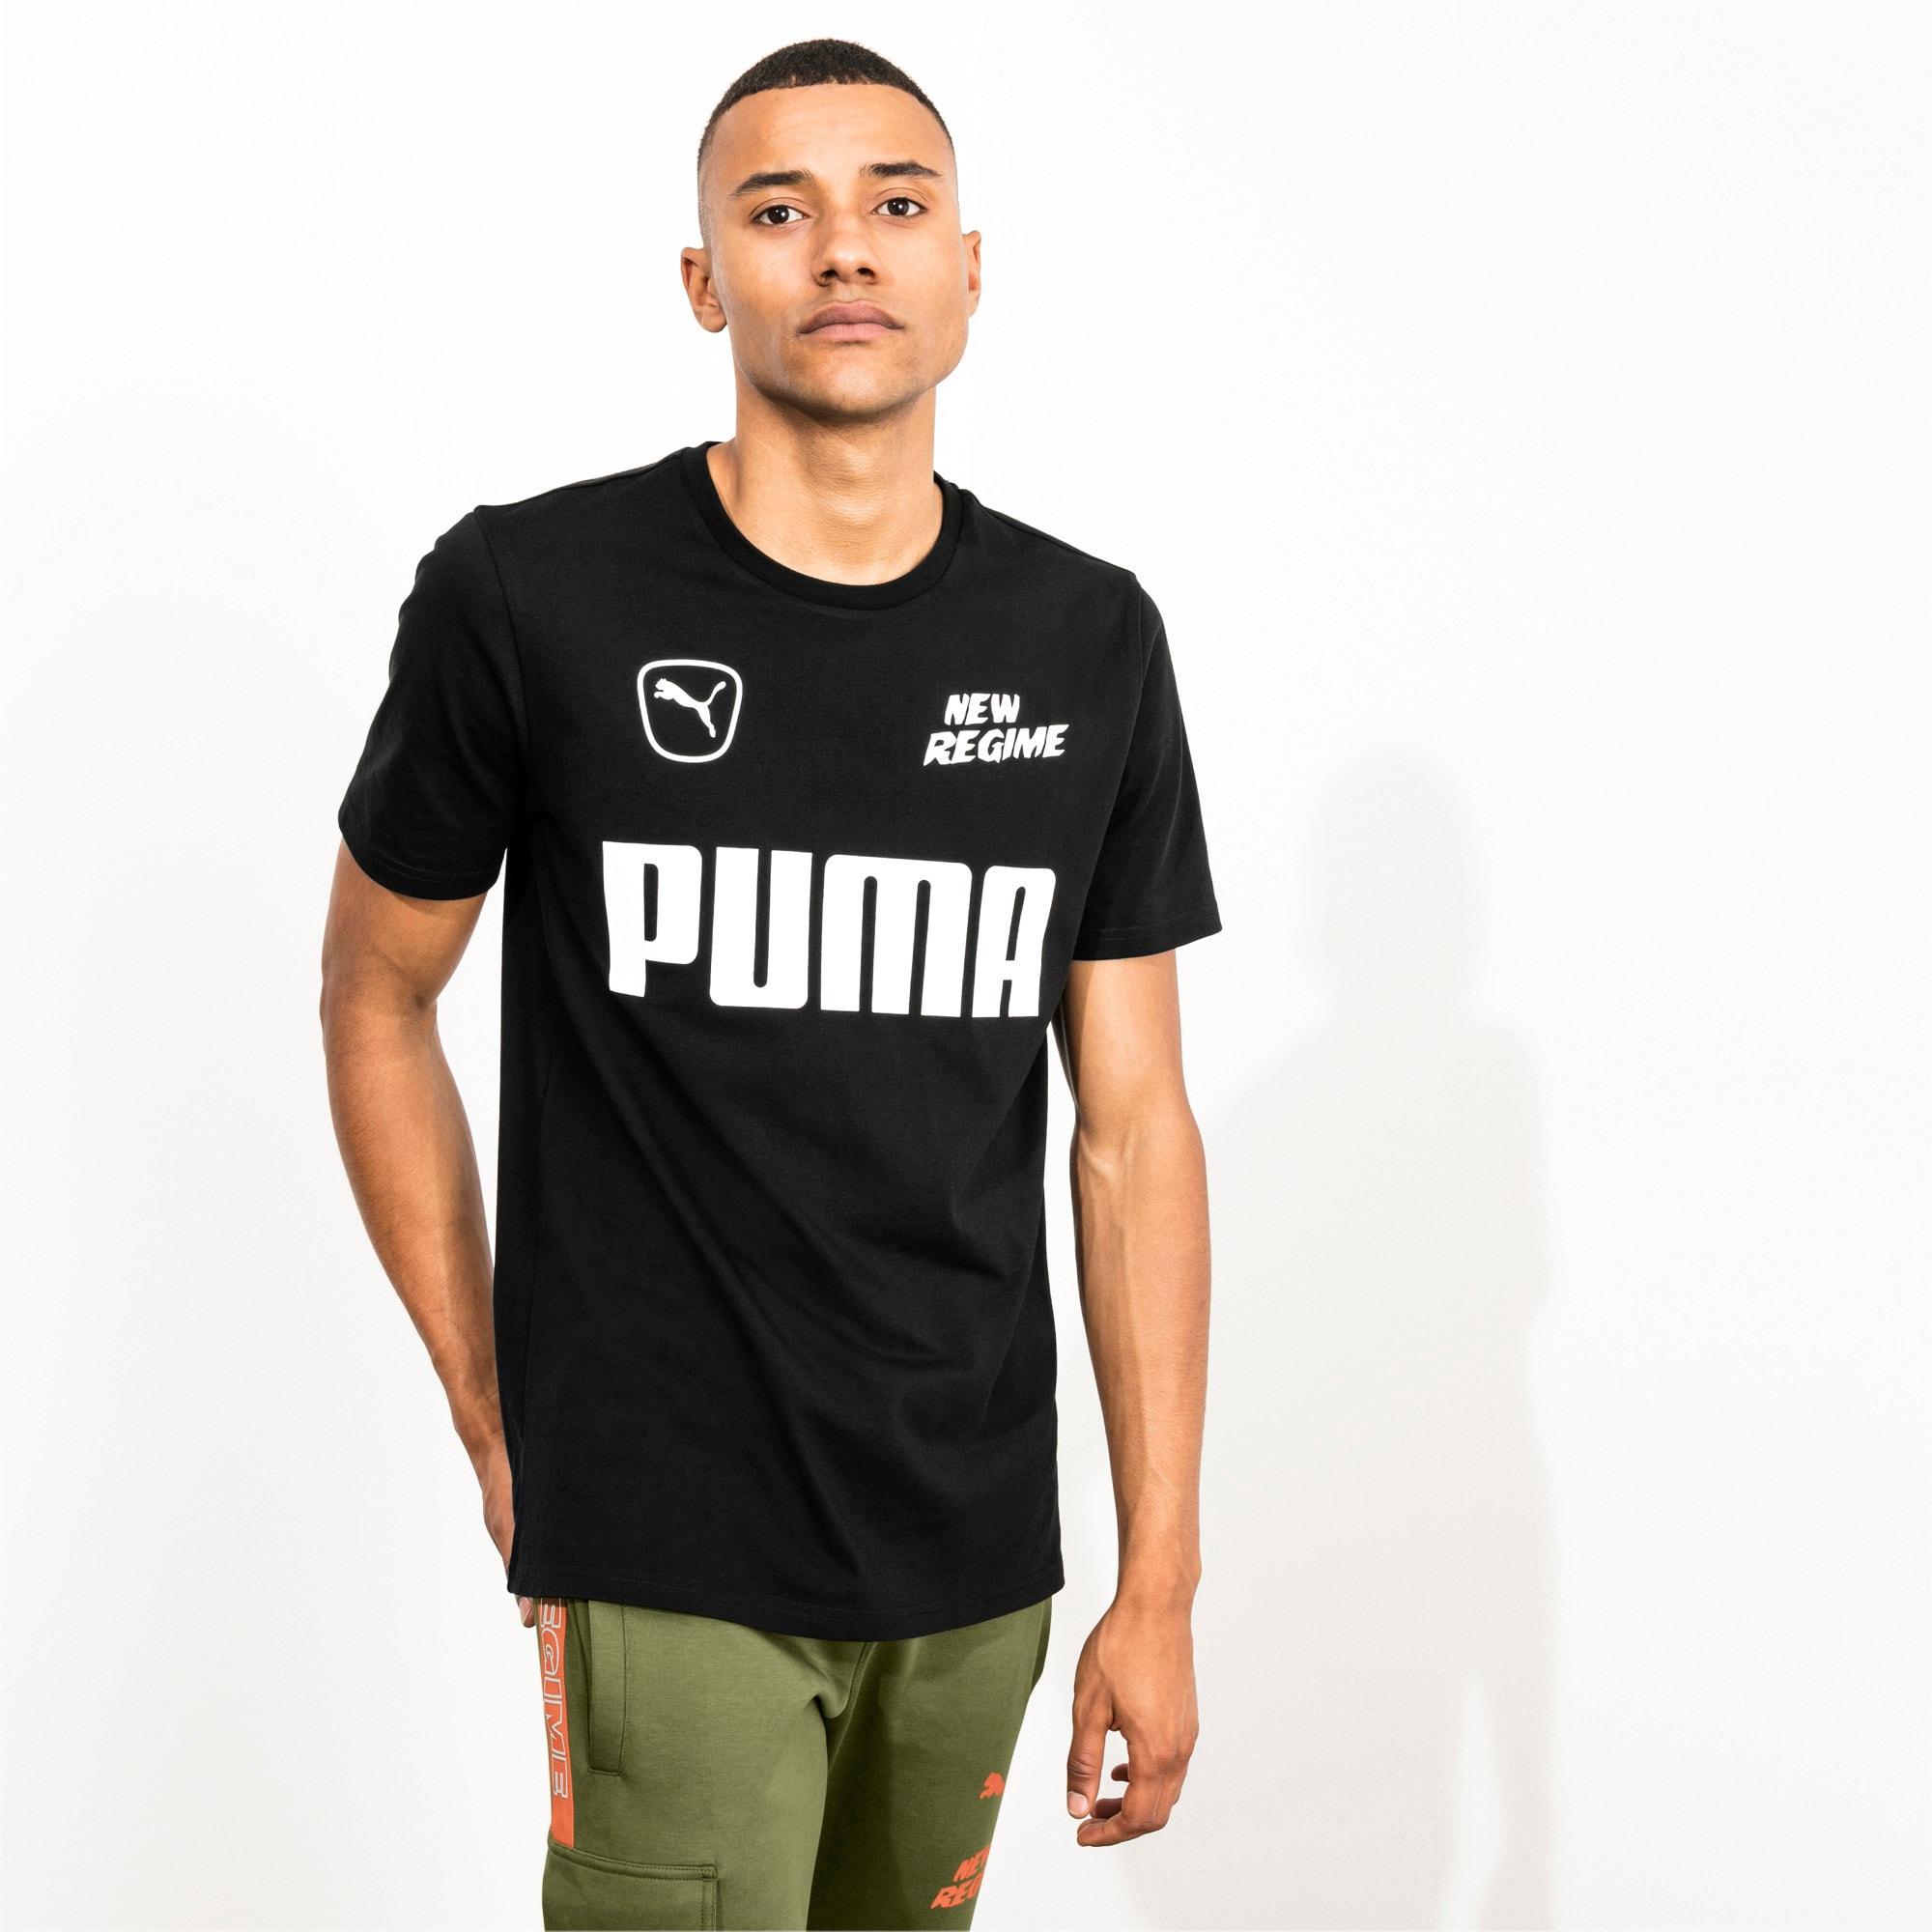 Thumbnail 2 of PUMA x ATELIER NEW REGIME Men's Tee, Puma Black, medium